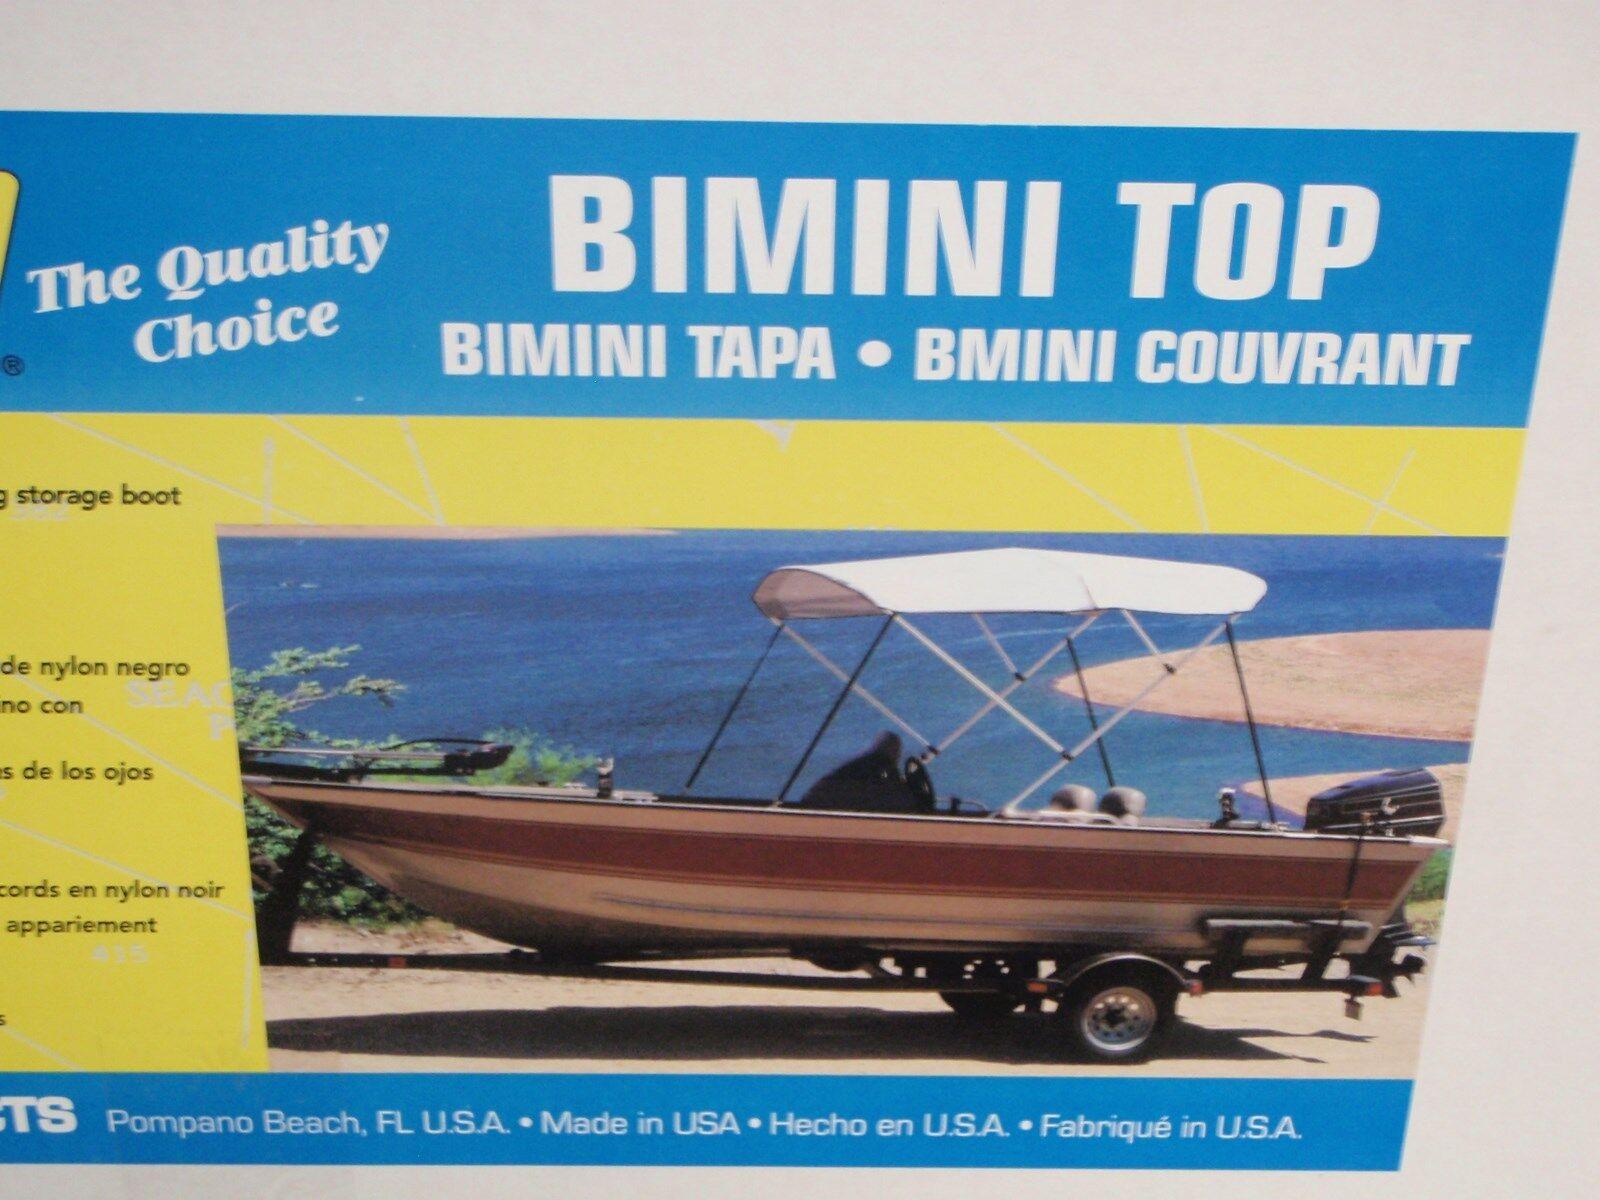 BIMINI TOP 3 BOW W/ BOOT 97861 WHITE MARINE GRADE PERFORMANCE POLY GUARD CANVAS